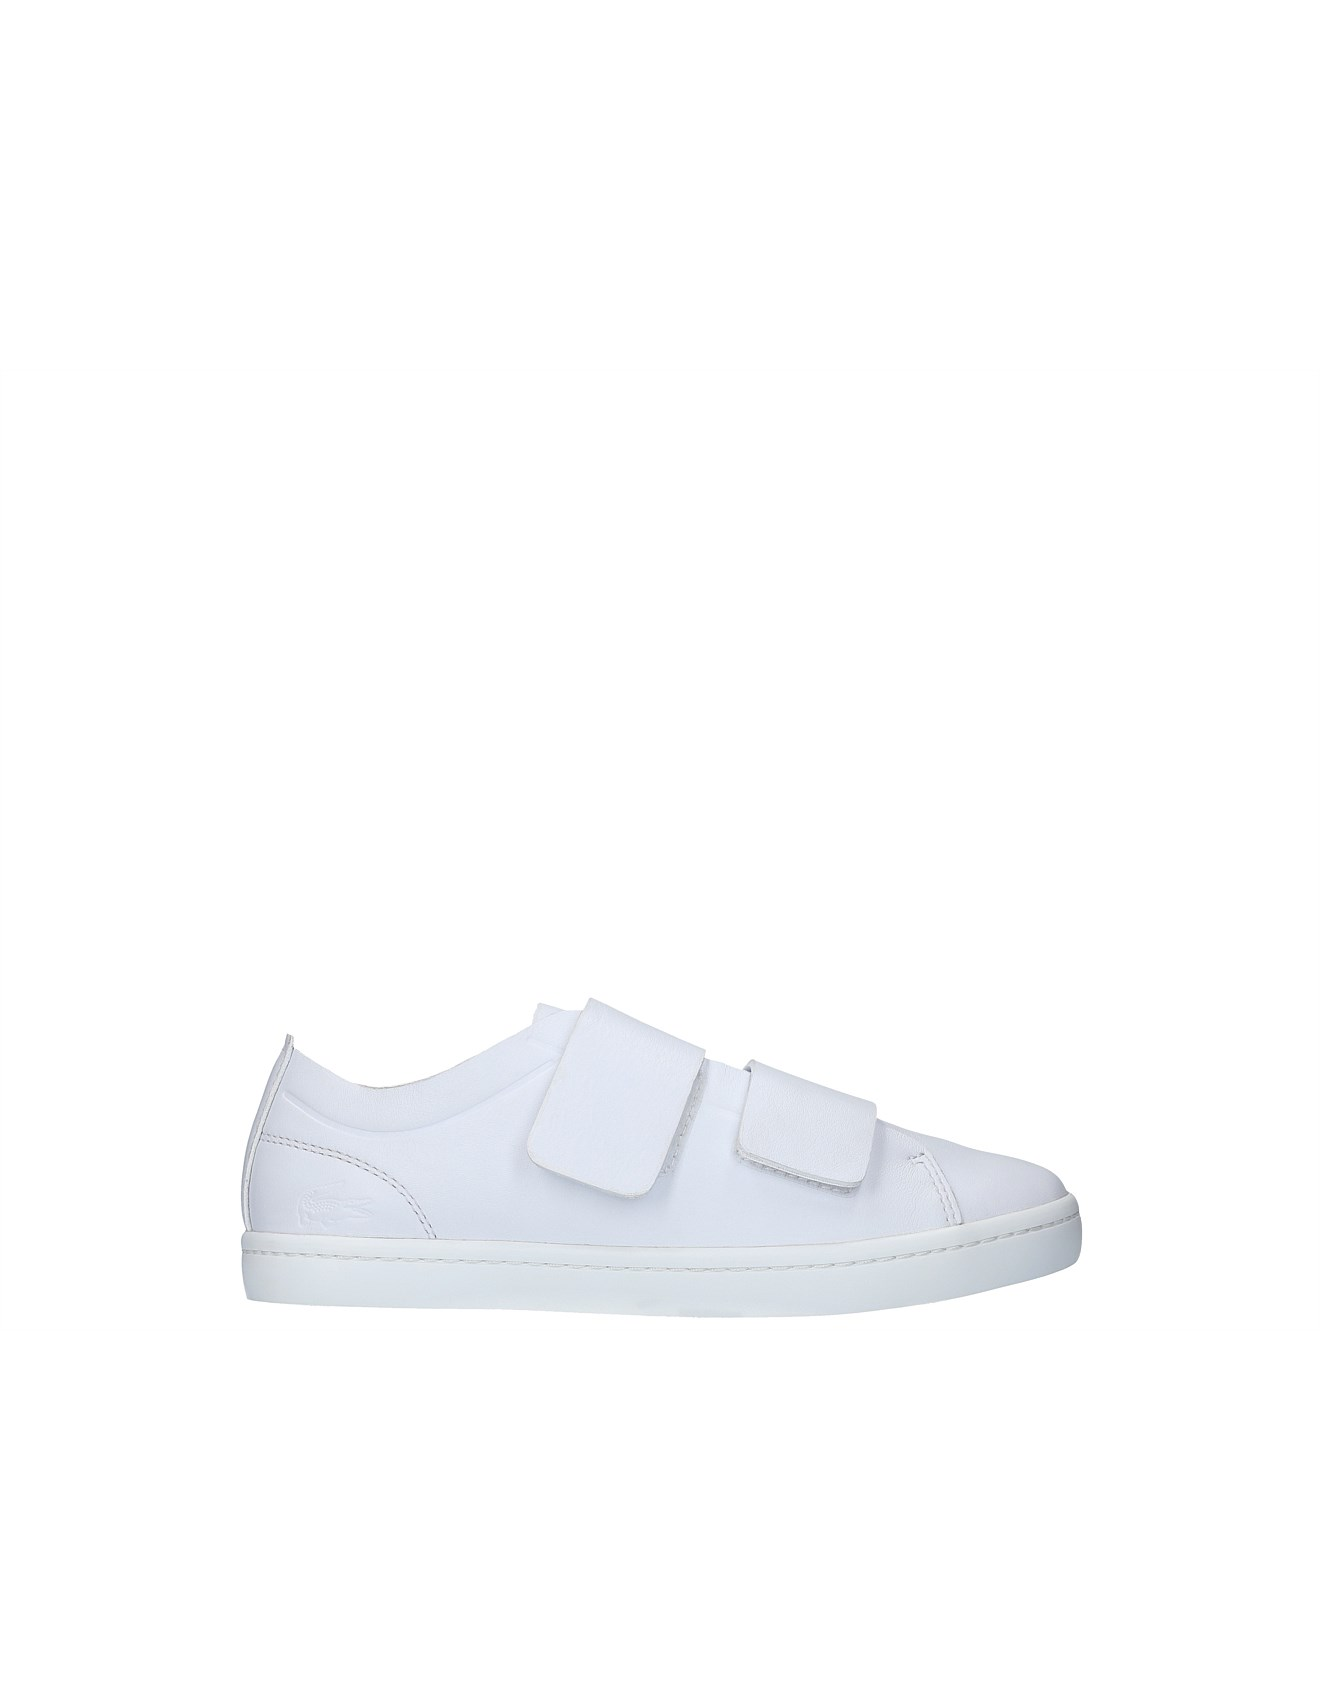 3a8d249da3ccfb Straightset Strap 118 1 Sneaker